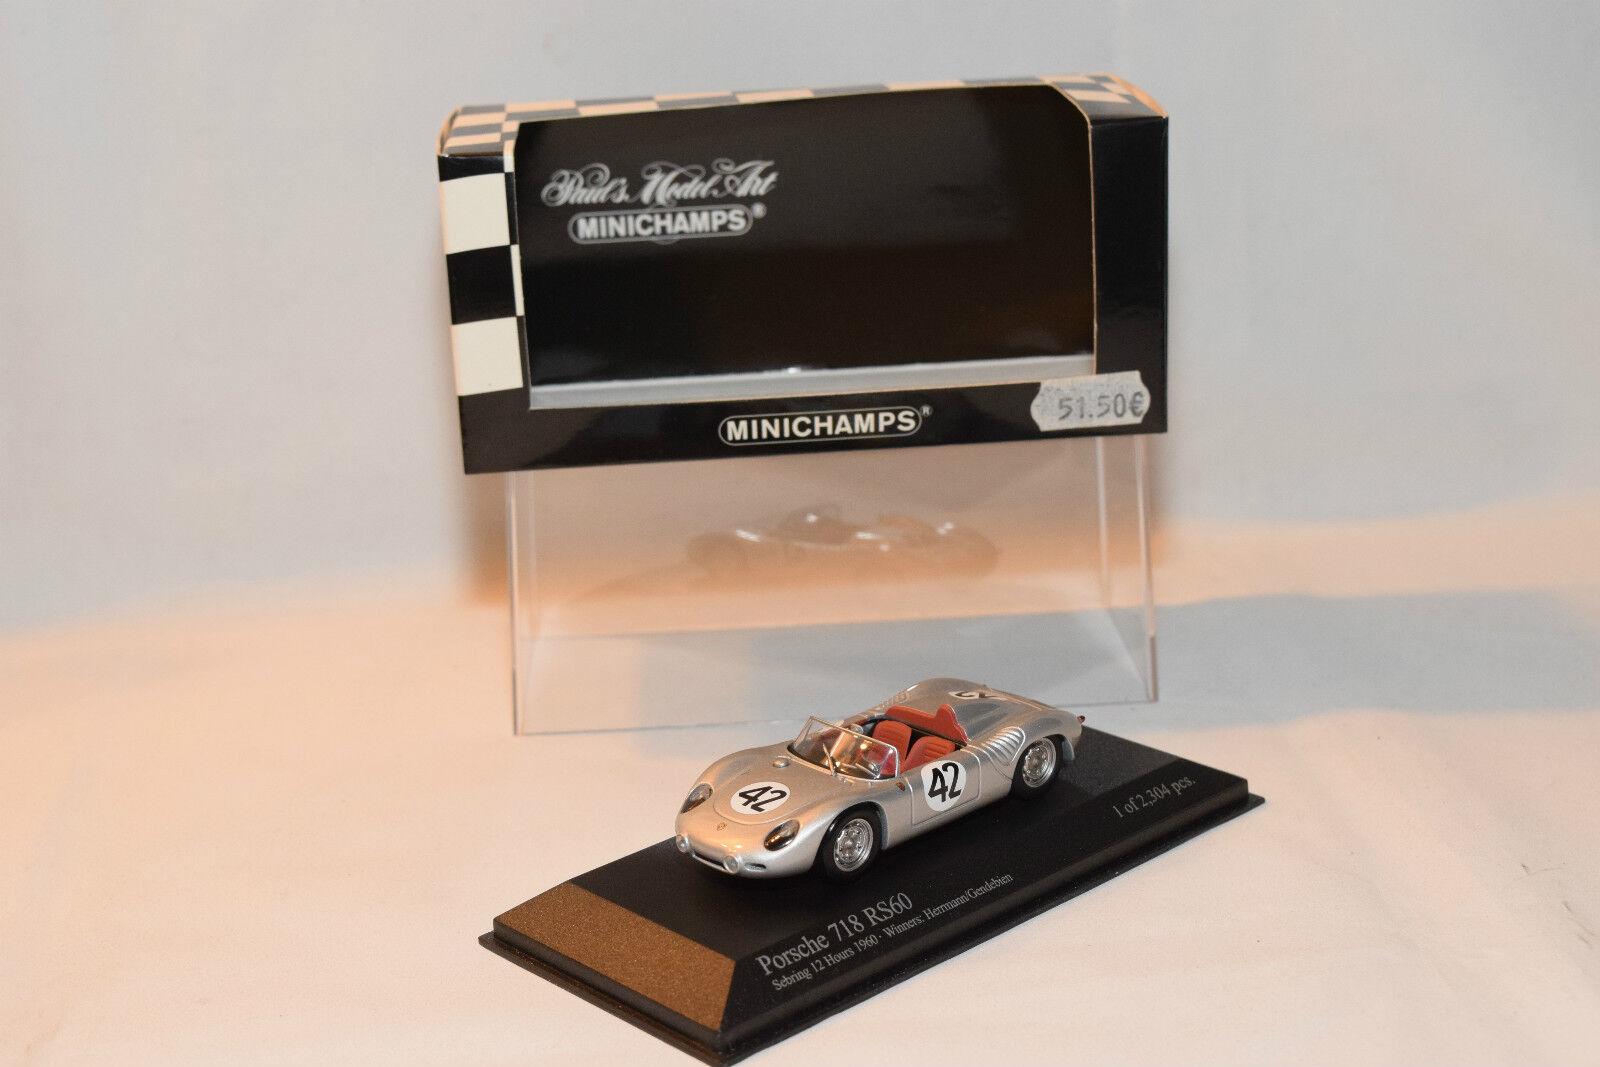 . MINICHAMPS PORSCHE 718 RS60 SEBRING 12 HOURS 1960 HERRMANN GENDEBIEN MINTBOXED